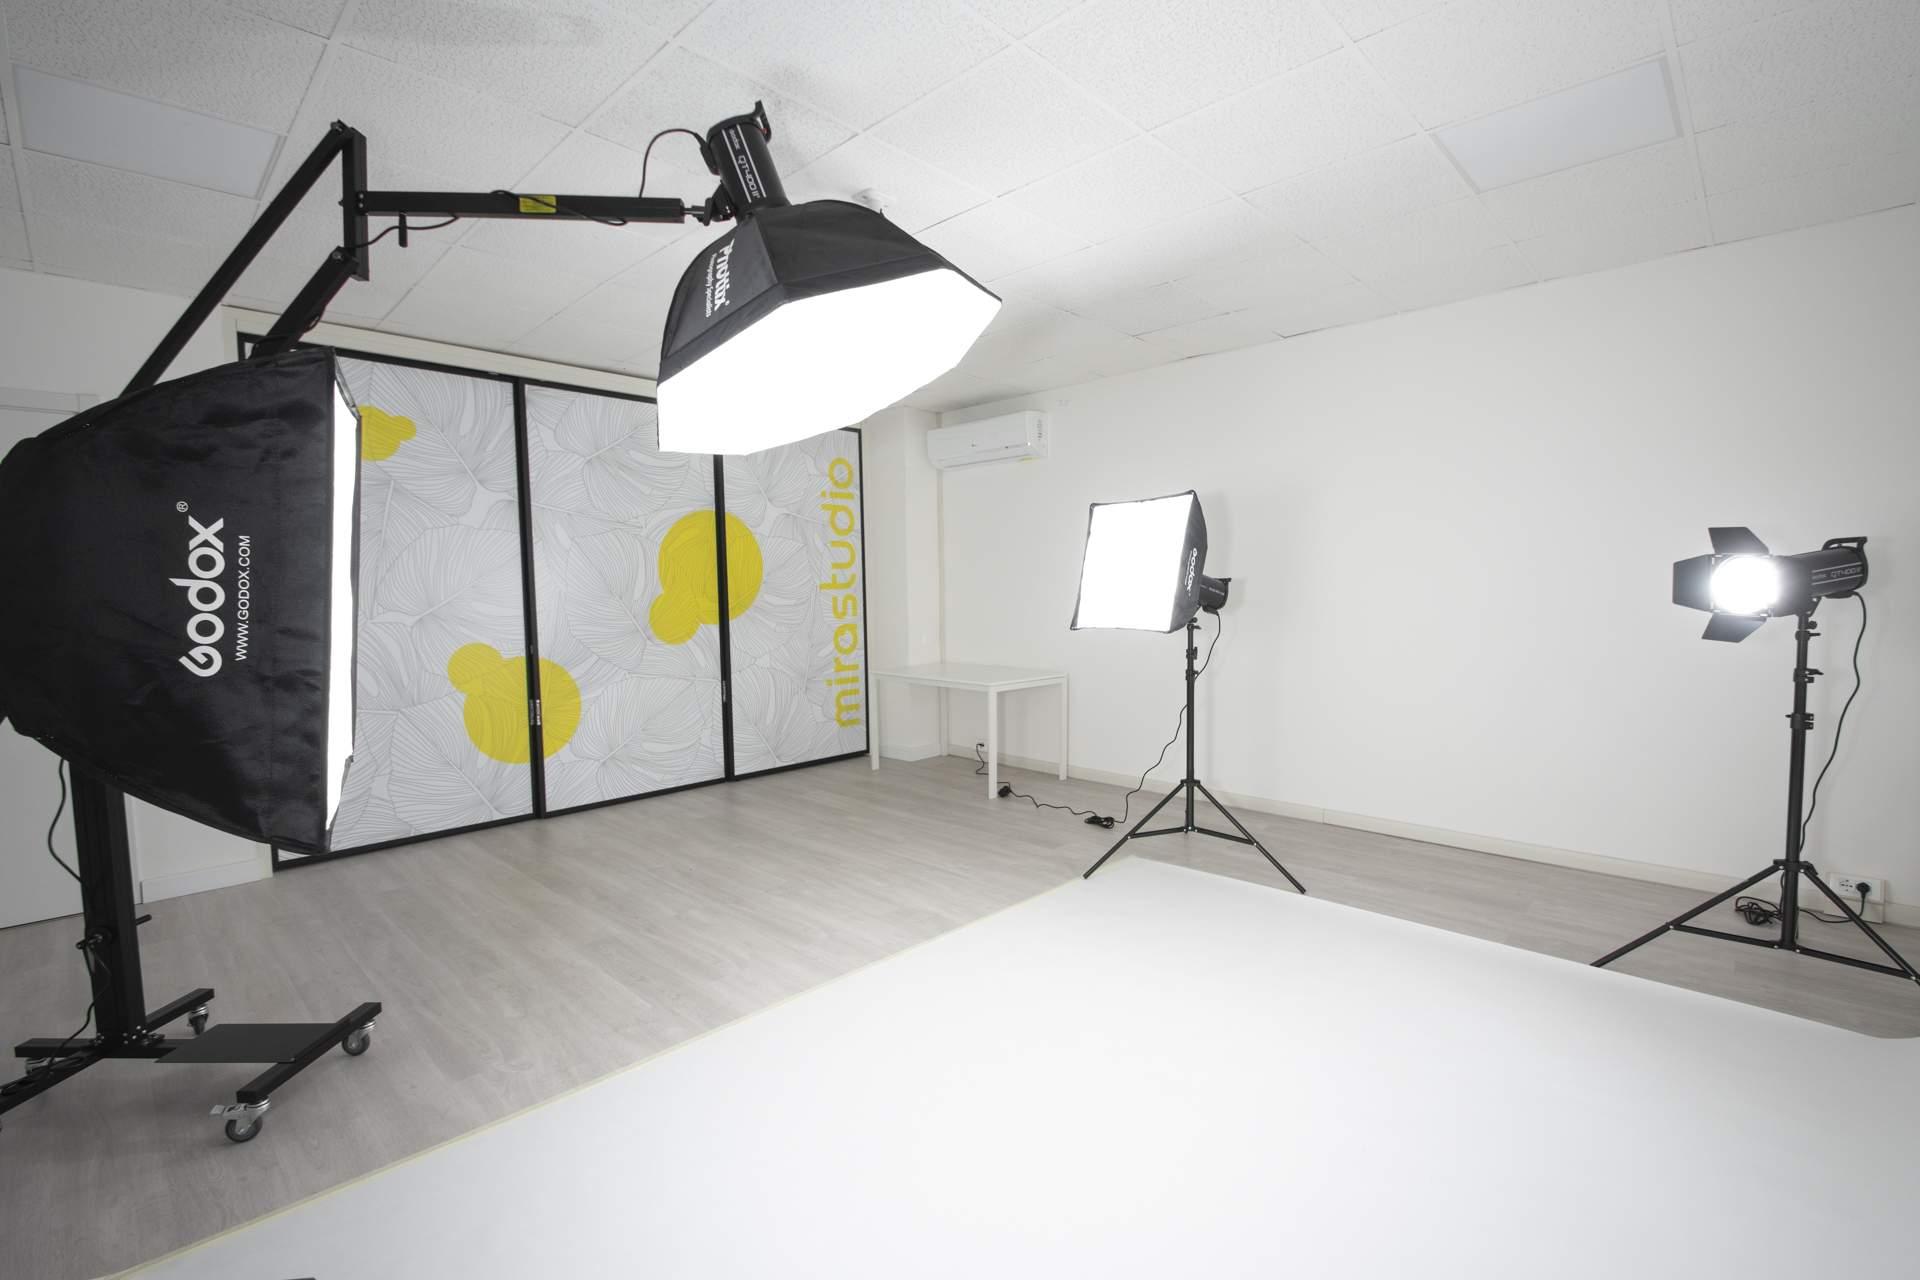 Studio fotografico Mirastudio - Hubmira